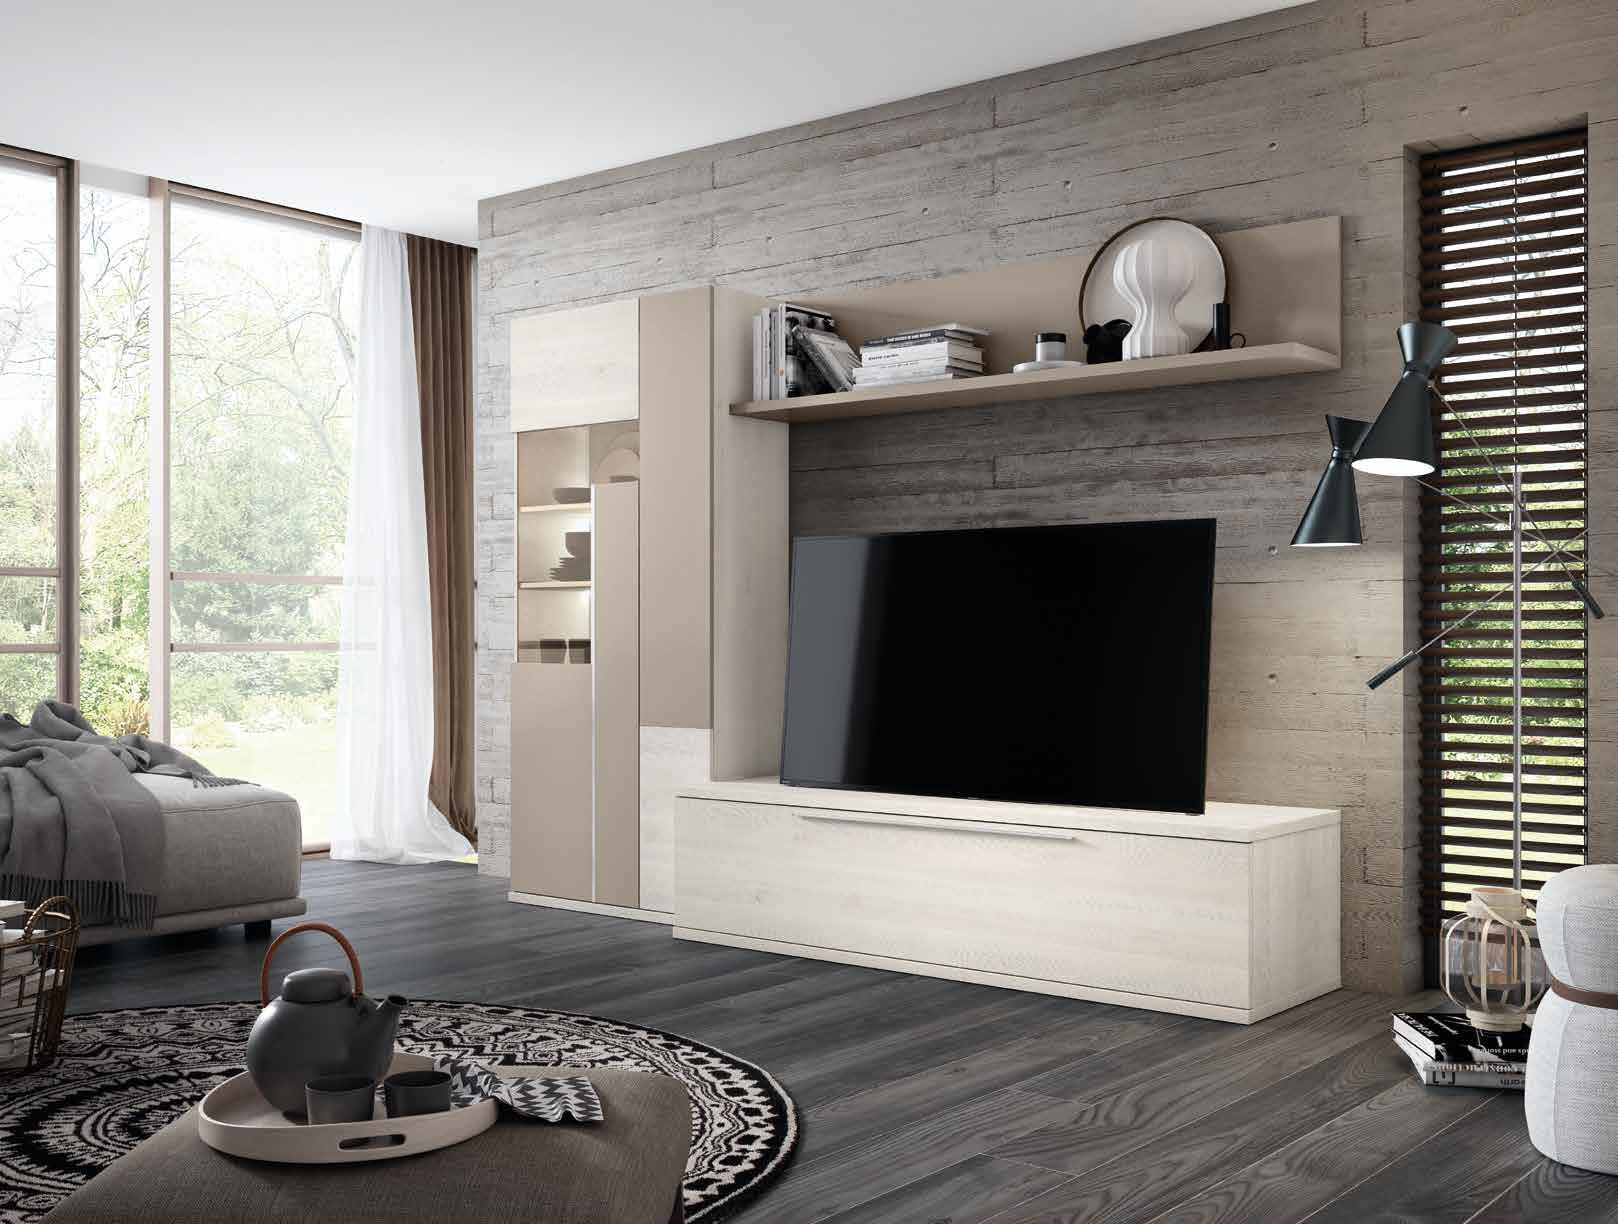 cubika-salon-039